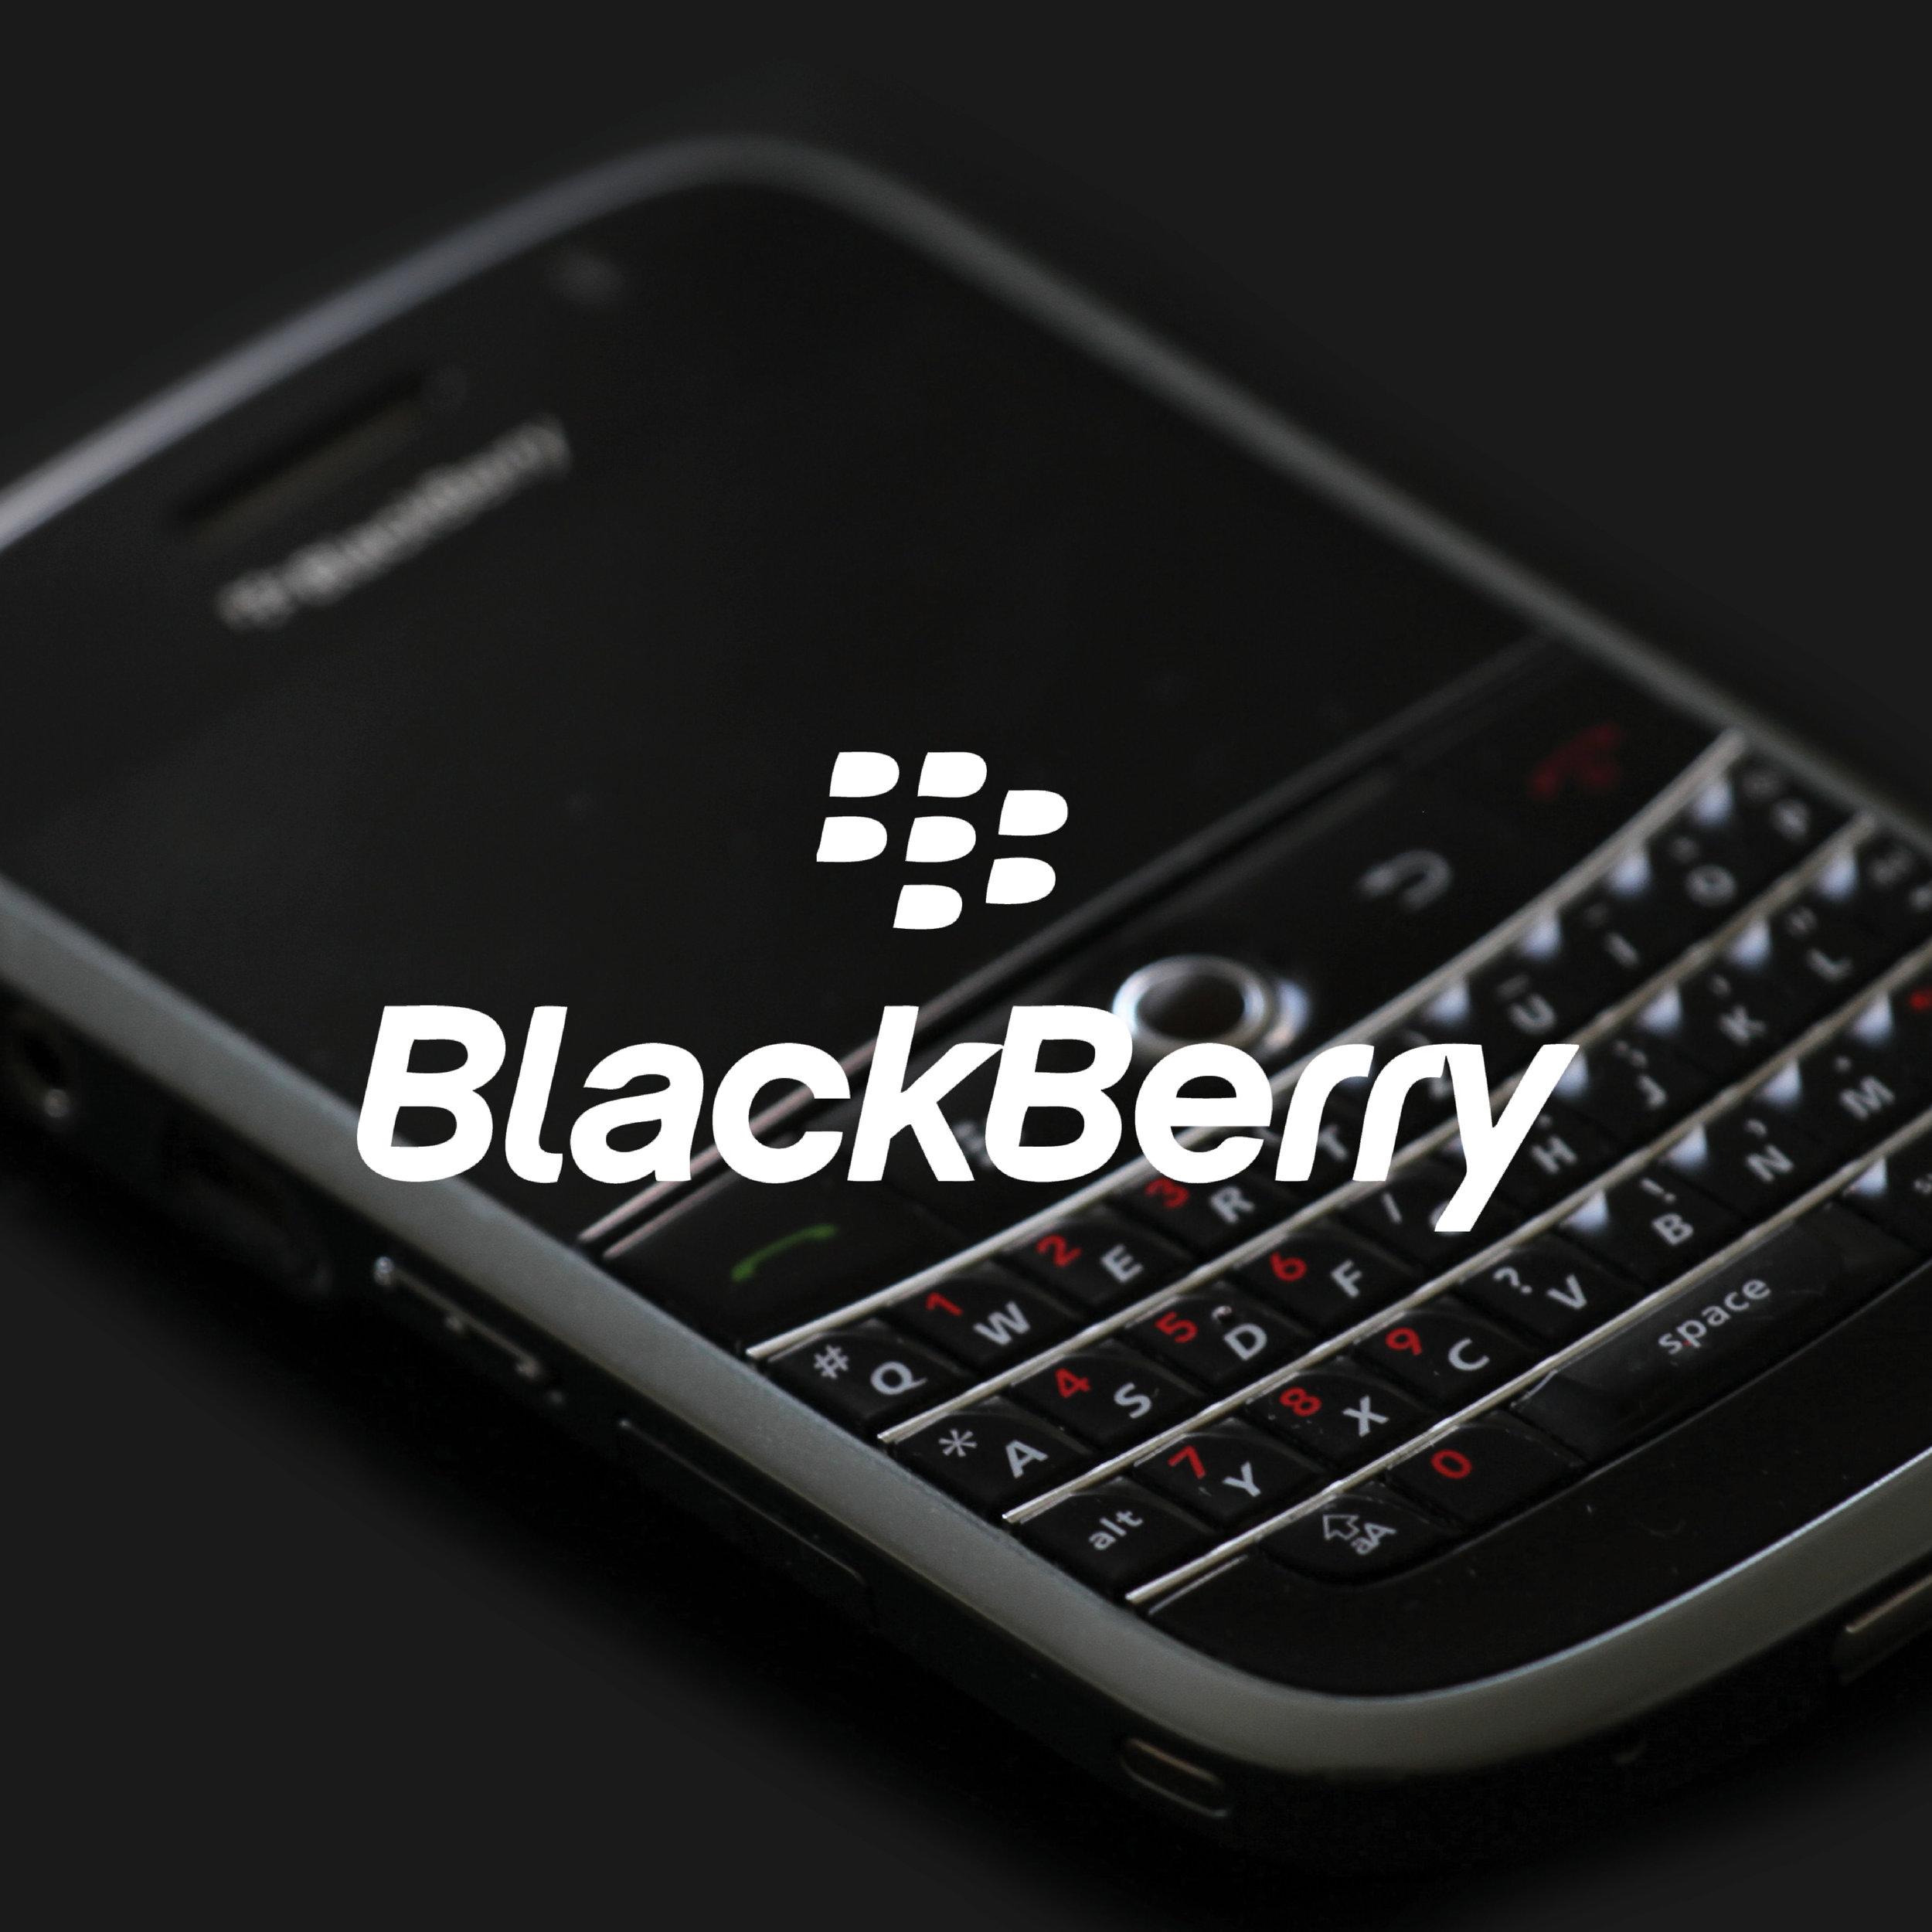 BlackBerry_credential.jpg